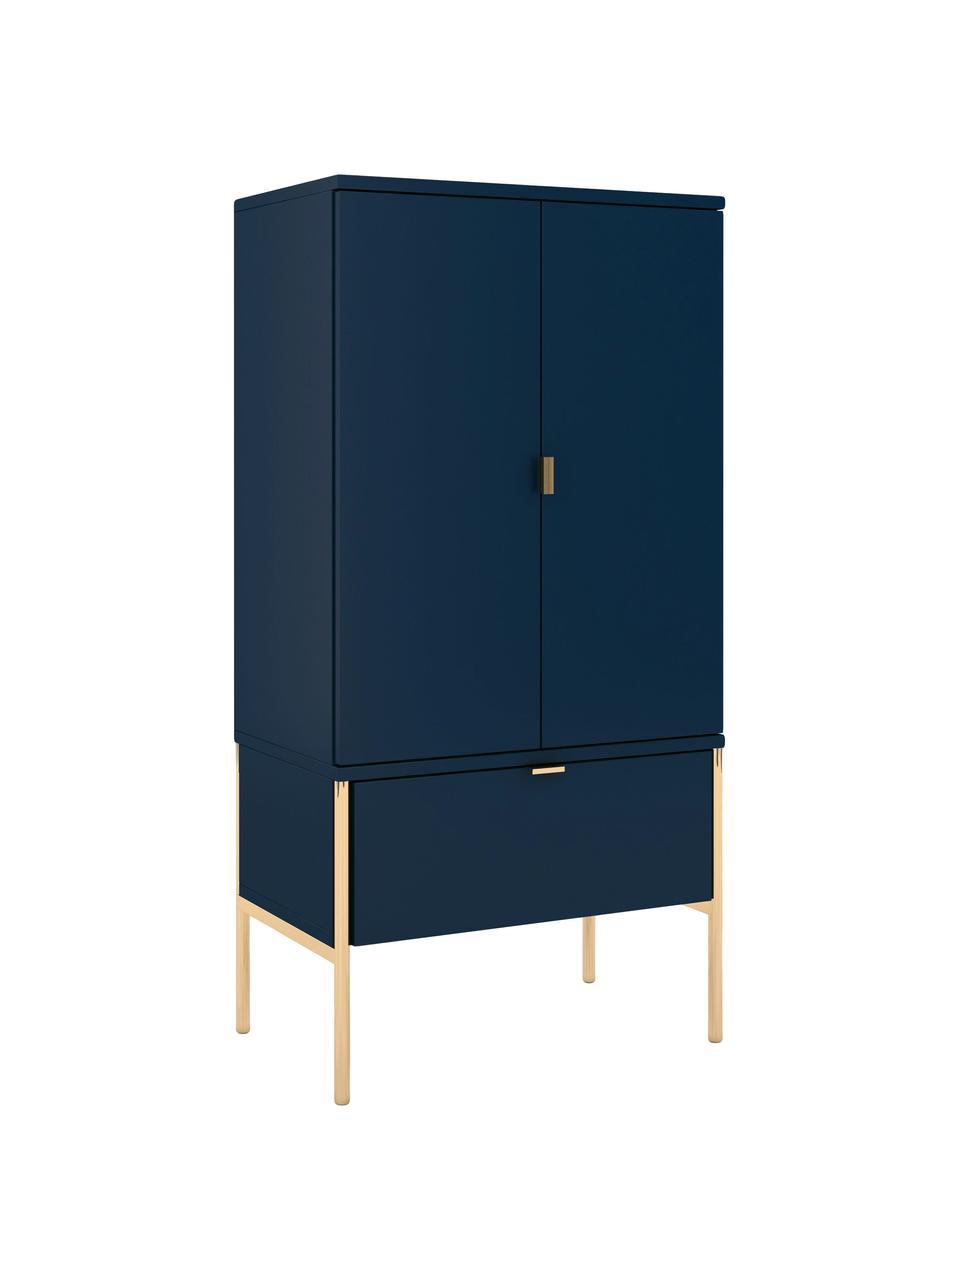 Credenza alta color blu scuro Polka, Blu scuro, Larg. 60 x Alt. 120 cm